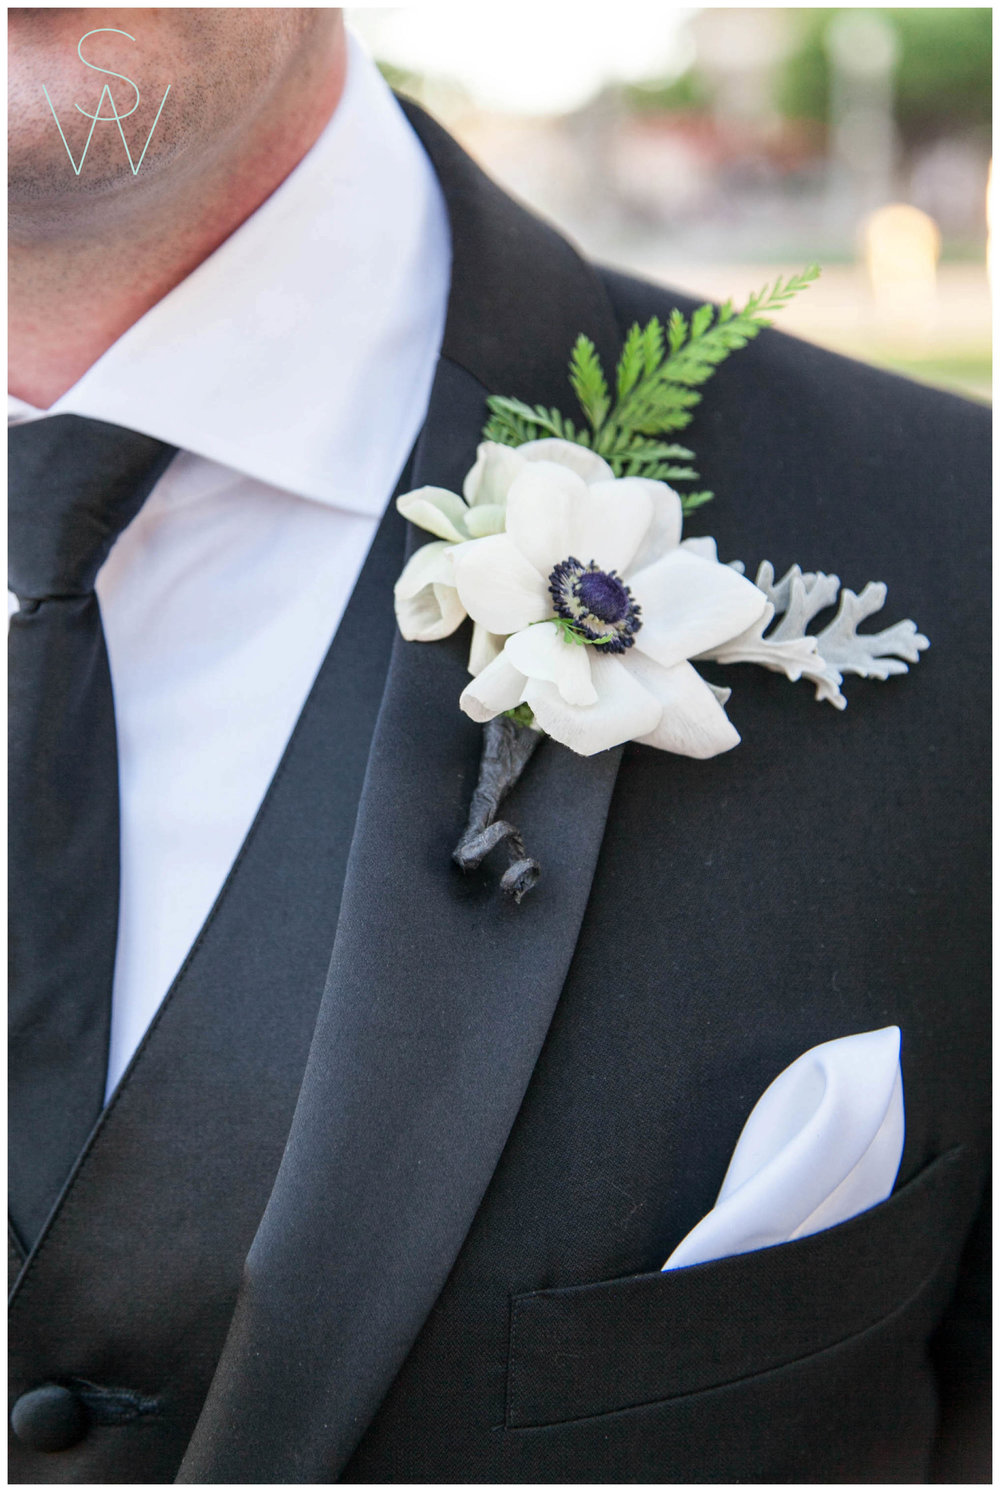 Shewanders.sdma_.wedding.photography-1015.jpg.wedding.photography-1015.jpg